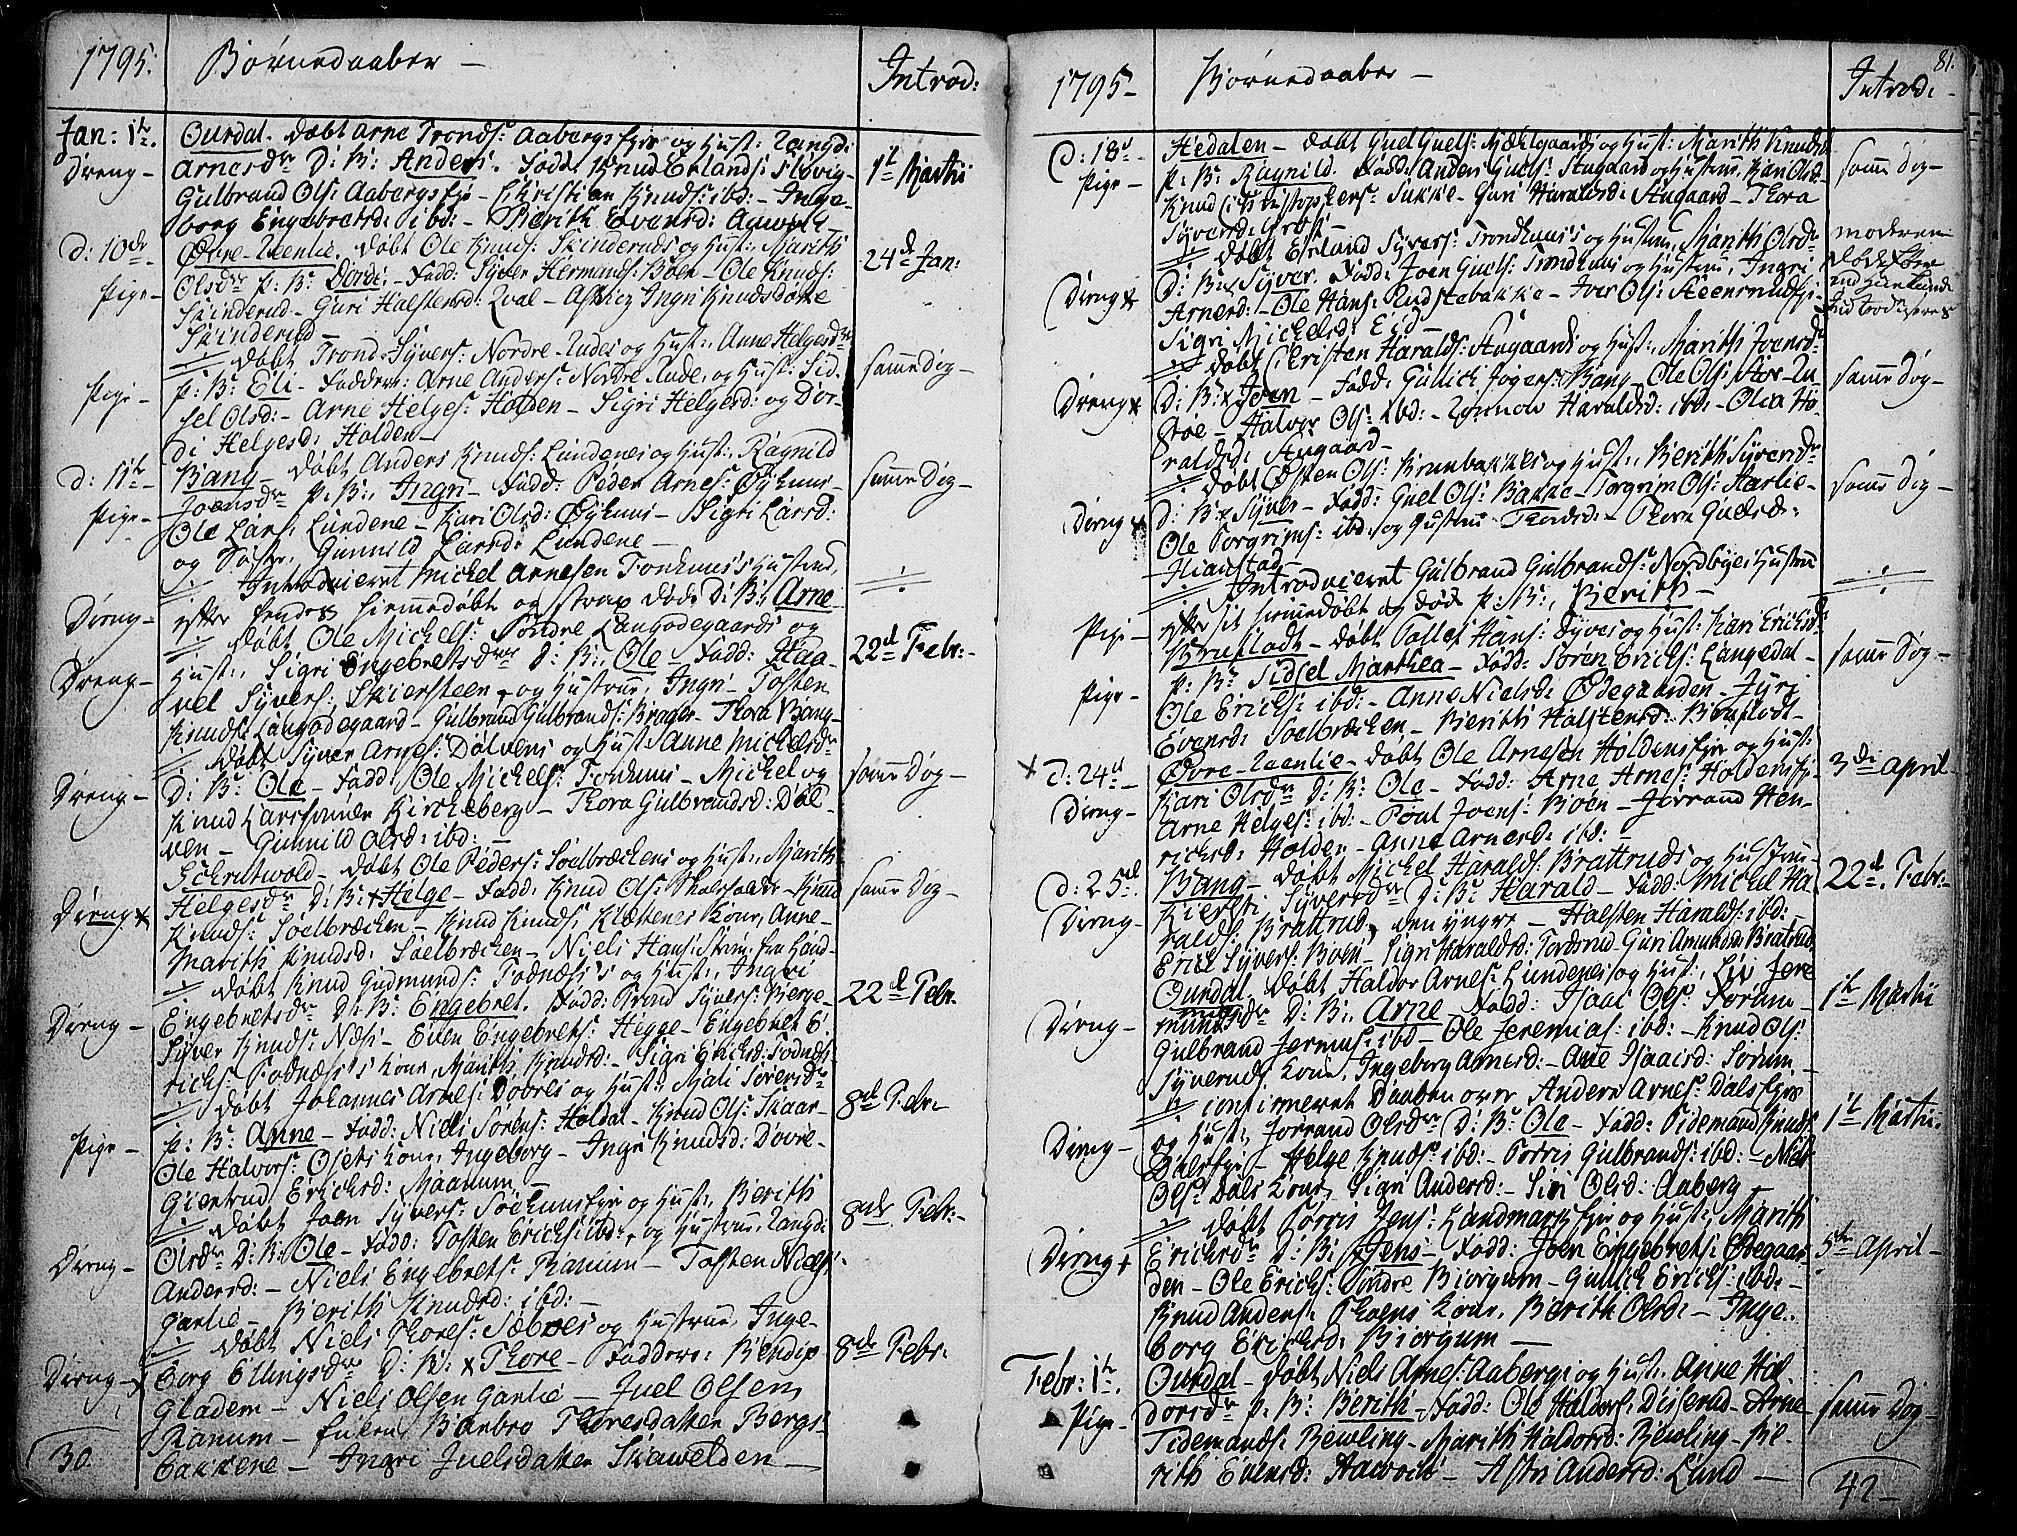 SAH, Aurdal prestekontor, Ministerialbok nr. 6, 1781-1804, s. 81